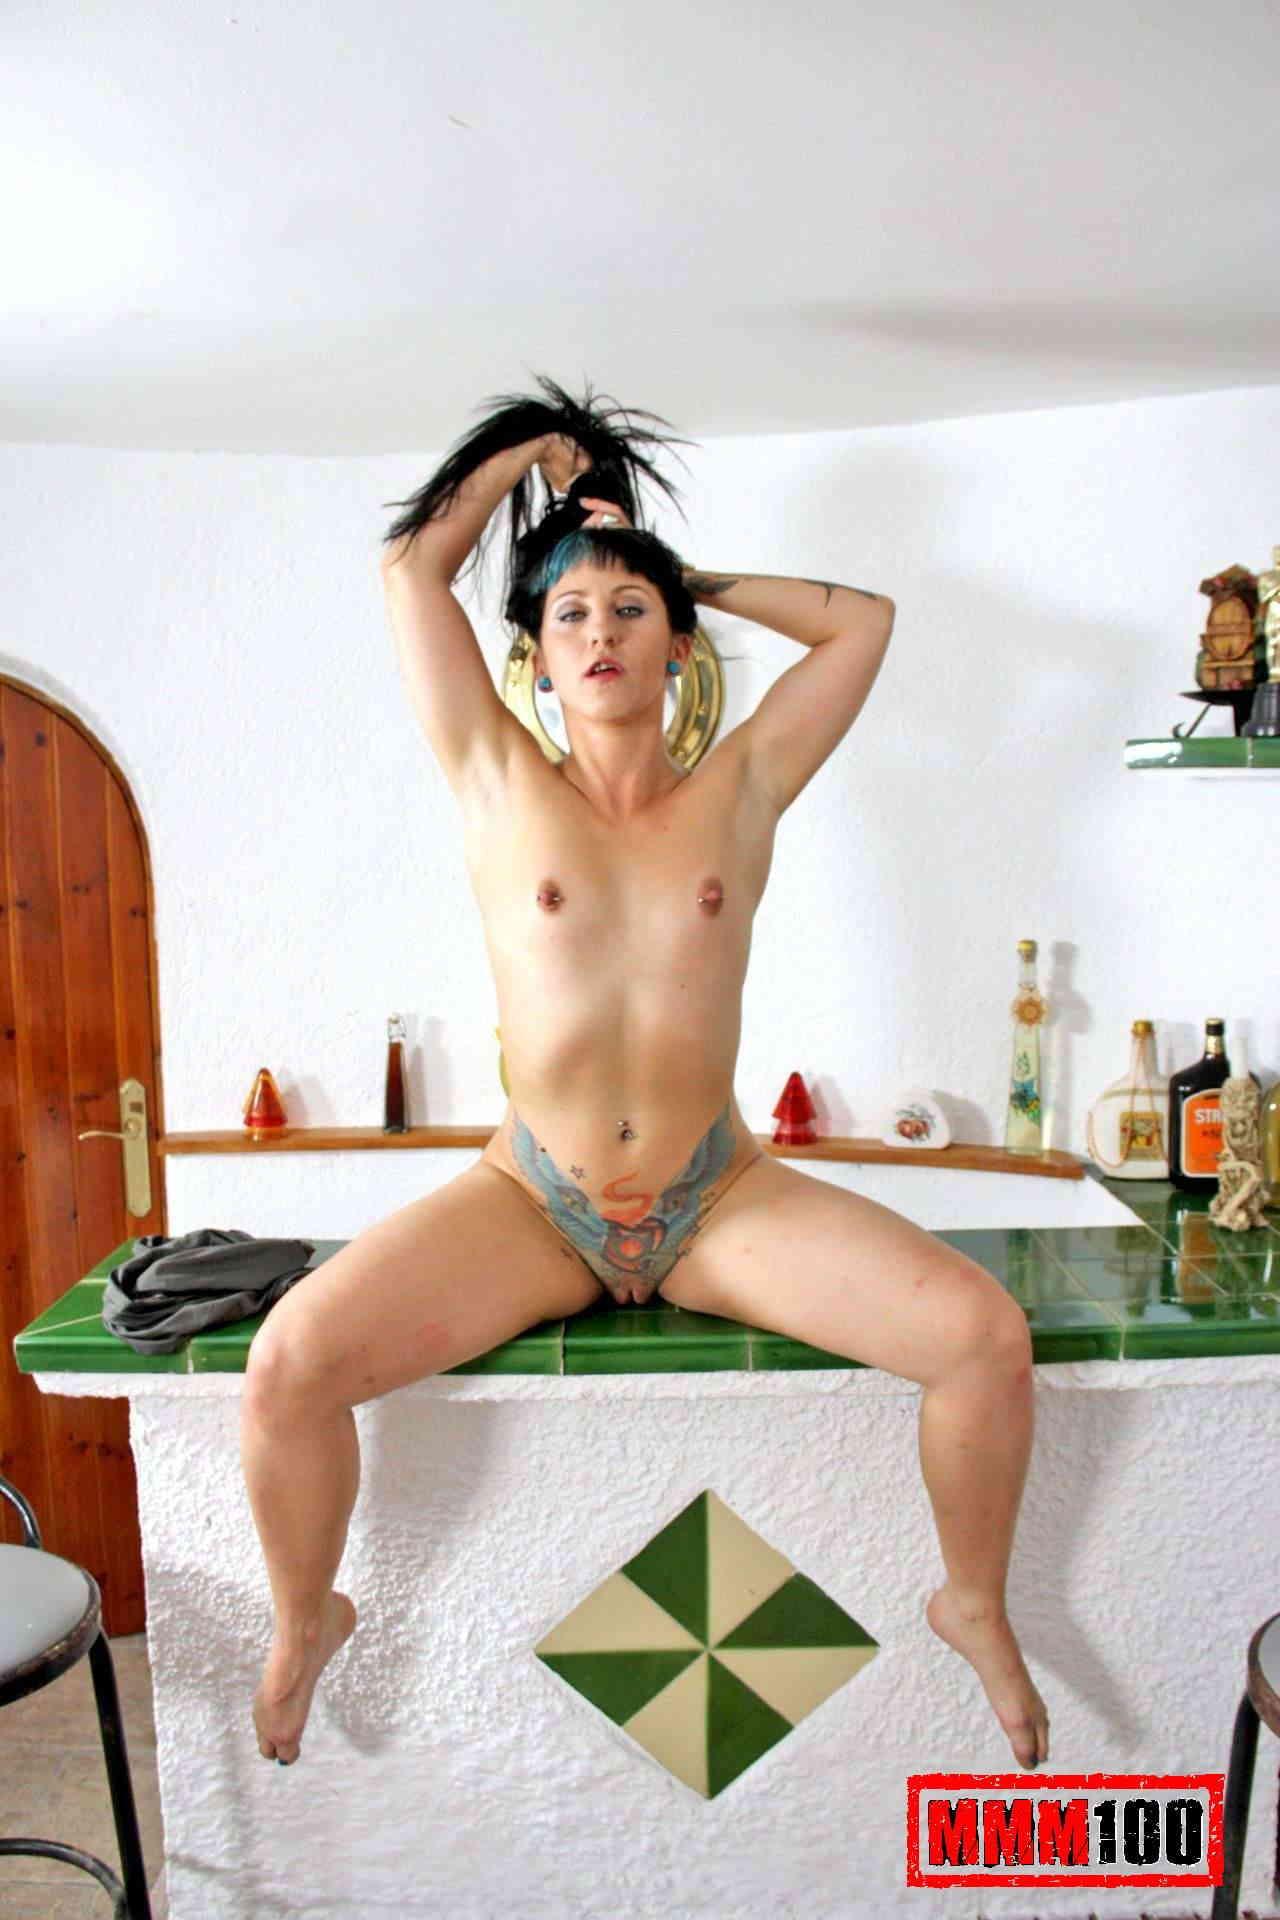 Horny snapchat sluts naked